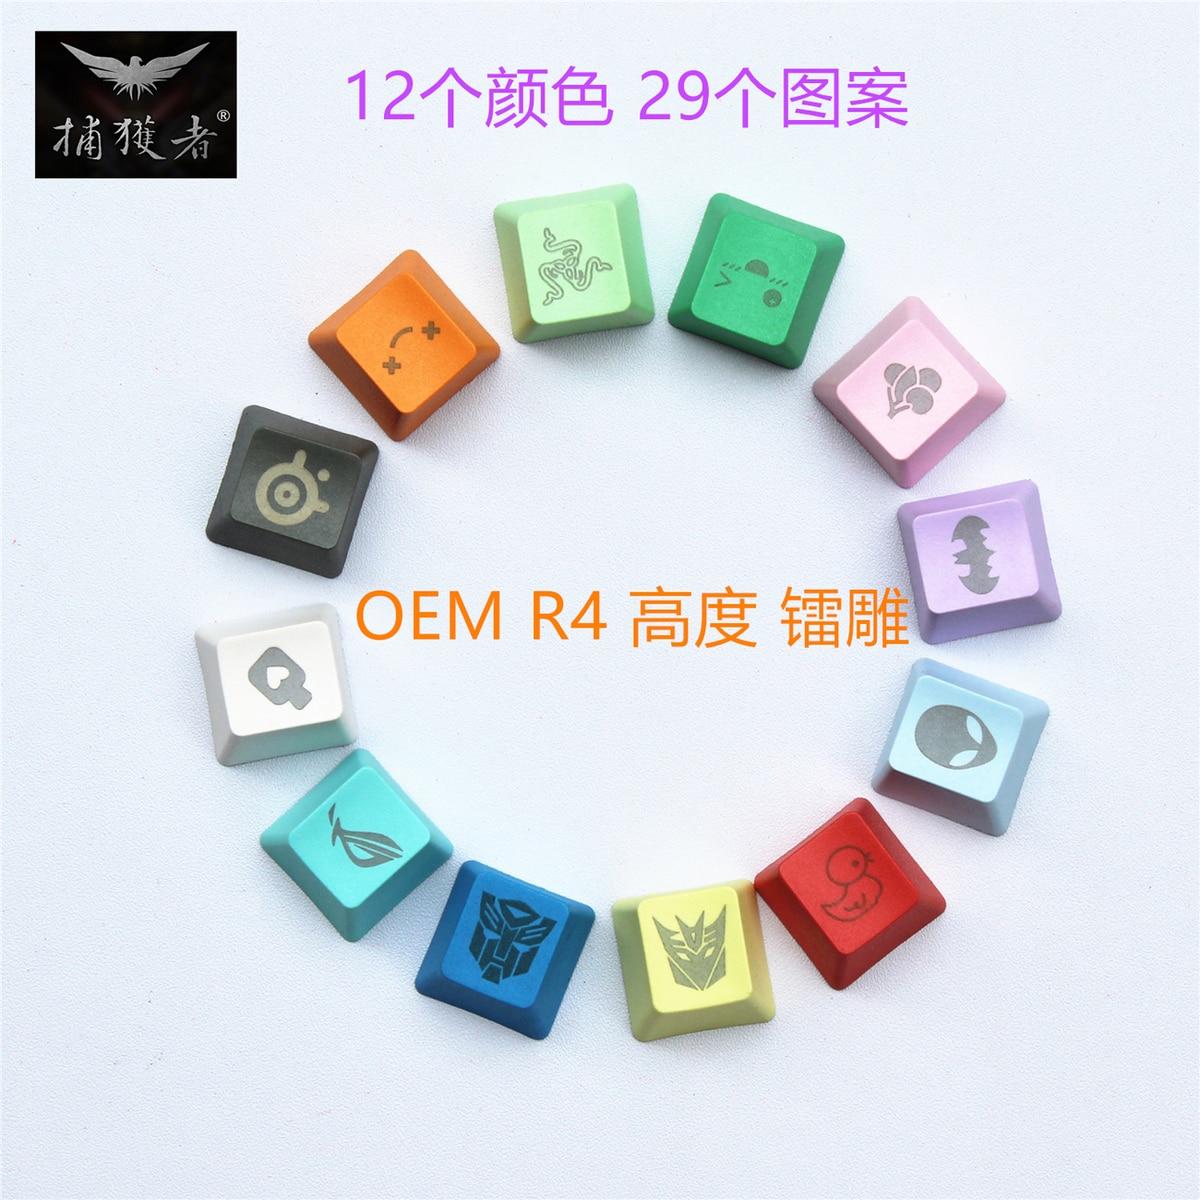 29 Pcs/set Oem R4 Key Cap Pbt Colorful Laser Carving Personality Keycap More Colour More Pattern